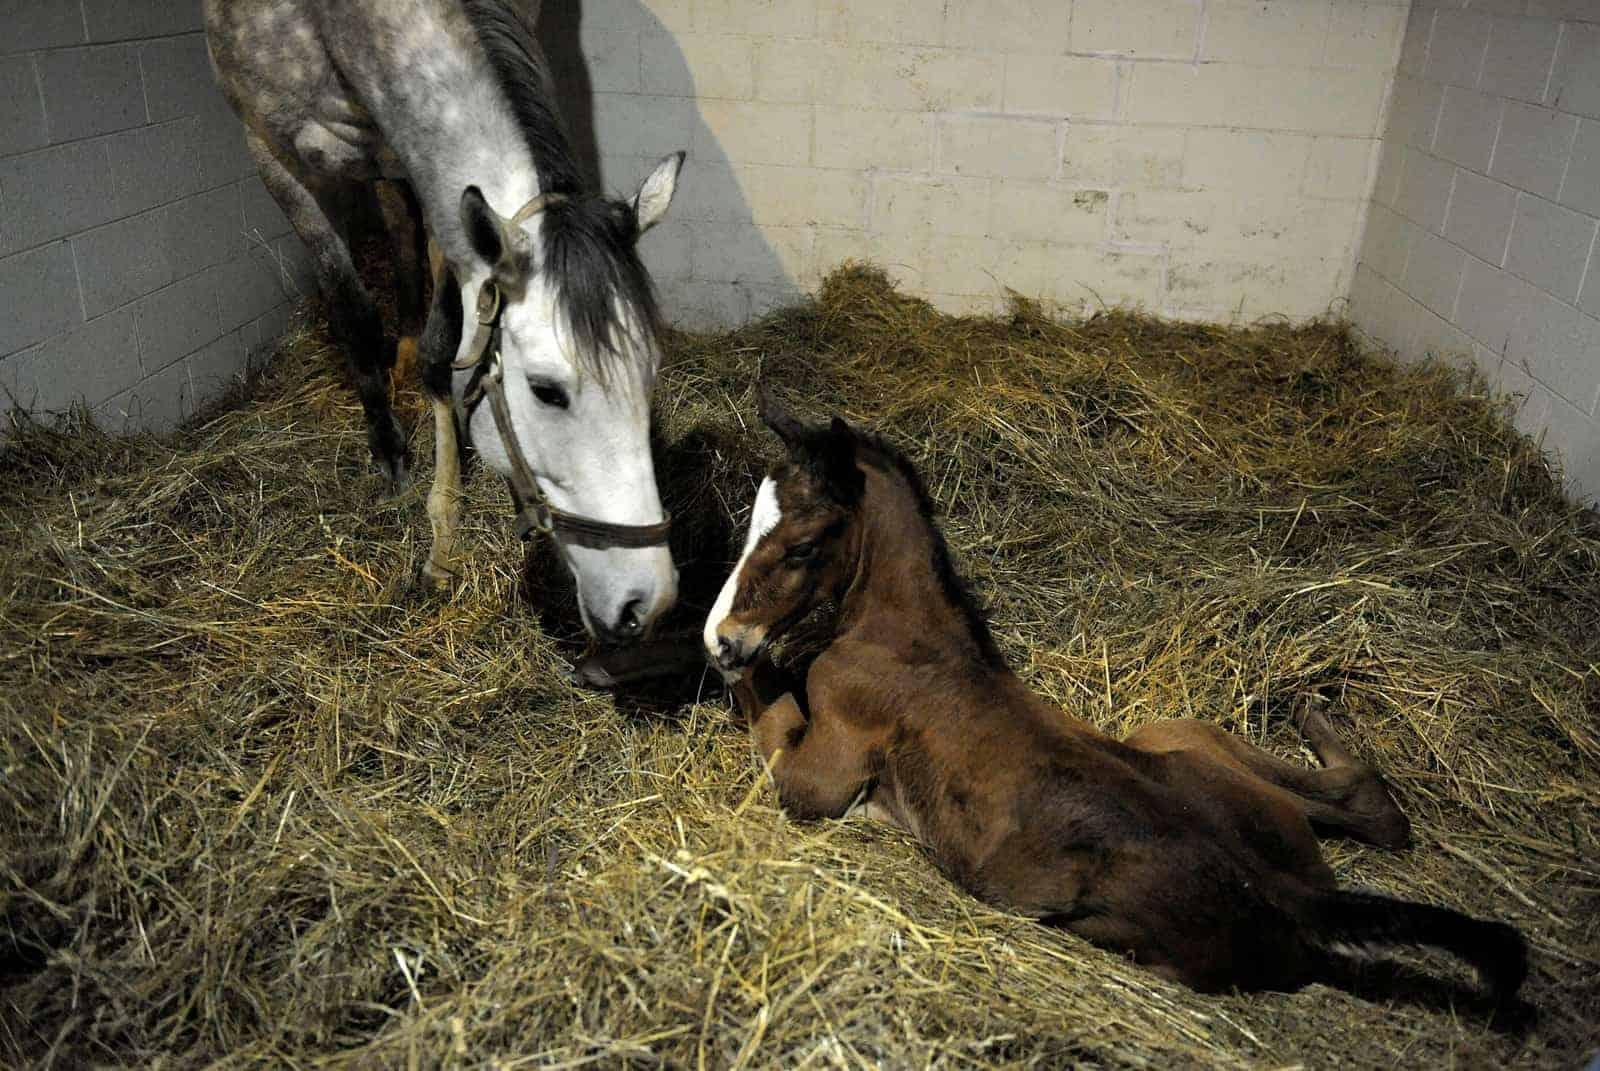 Do Probiotics Help Prevent Foal Diarrhea? - The Horse